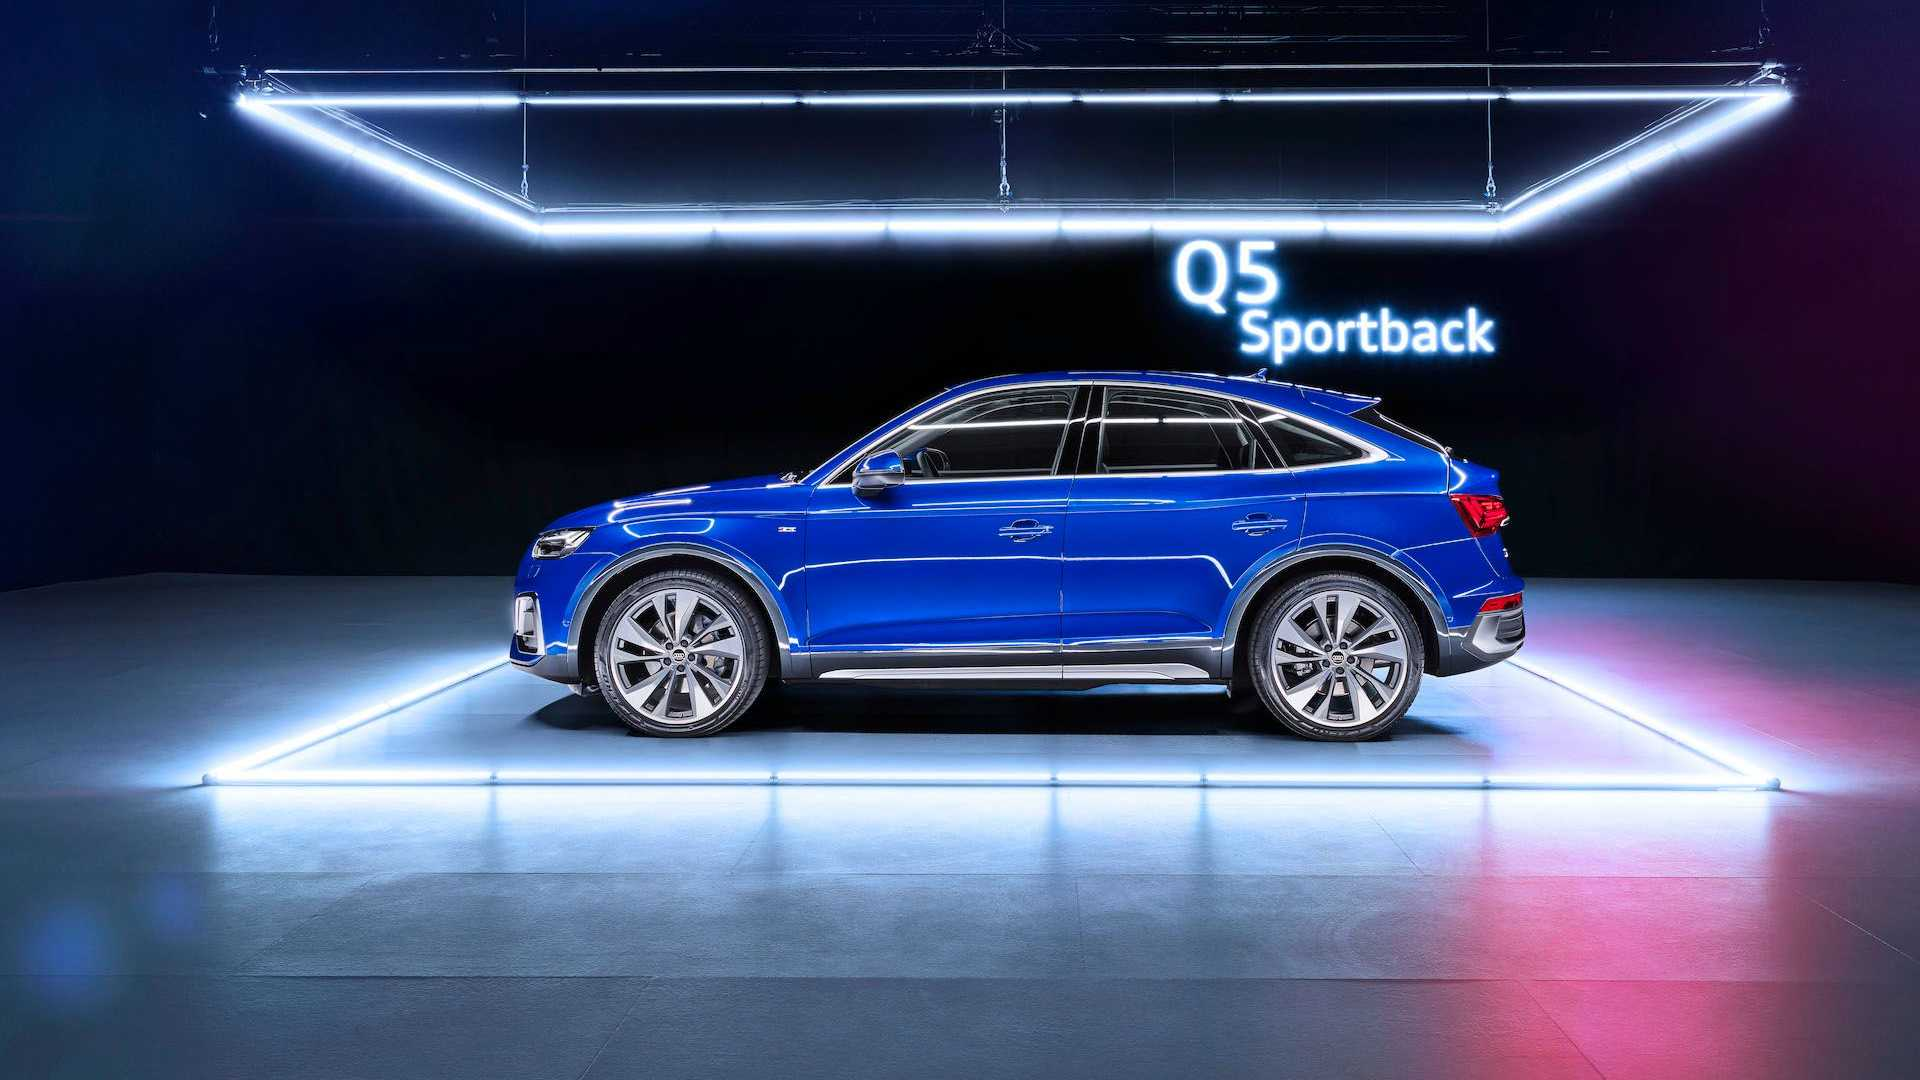 Audi Q5 Sportback 2021 года стоит от 47 800 долларов, SQ5 — от 56 100 долларов